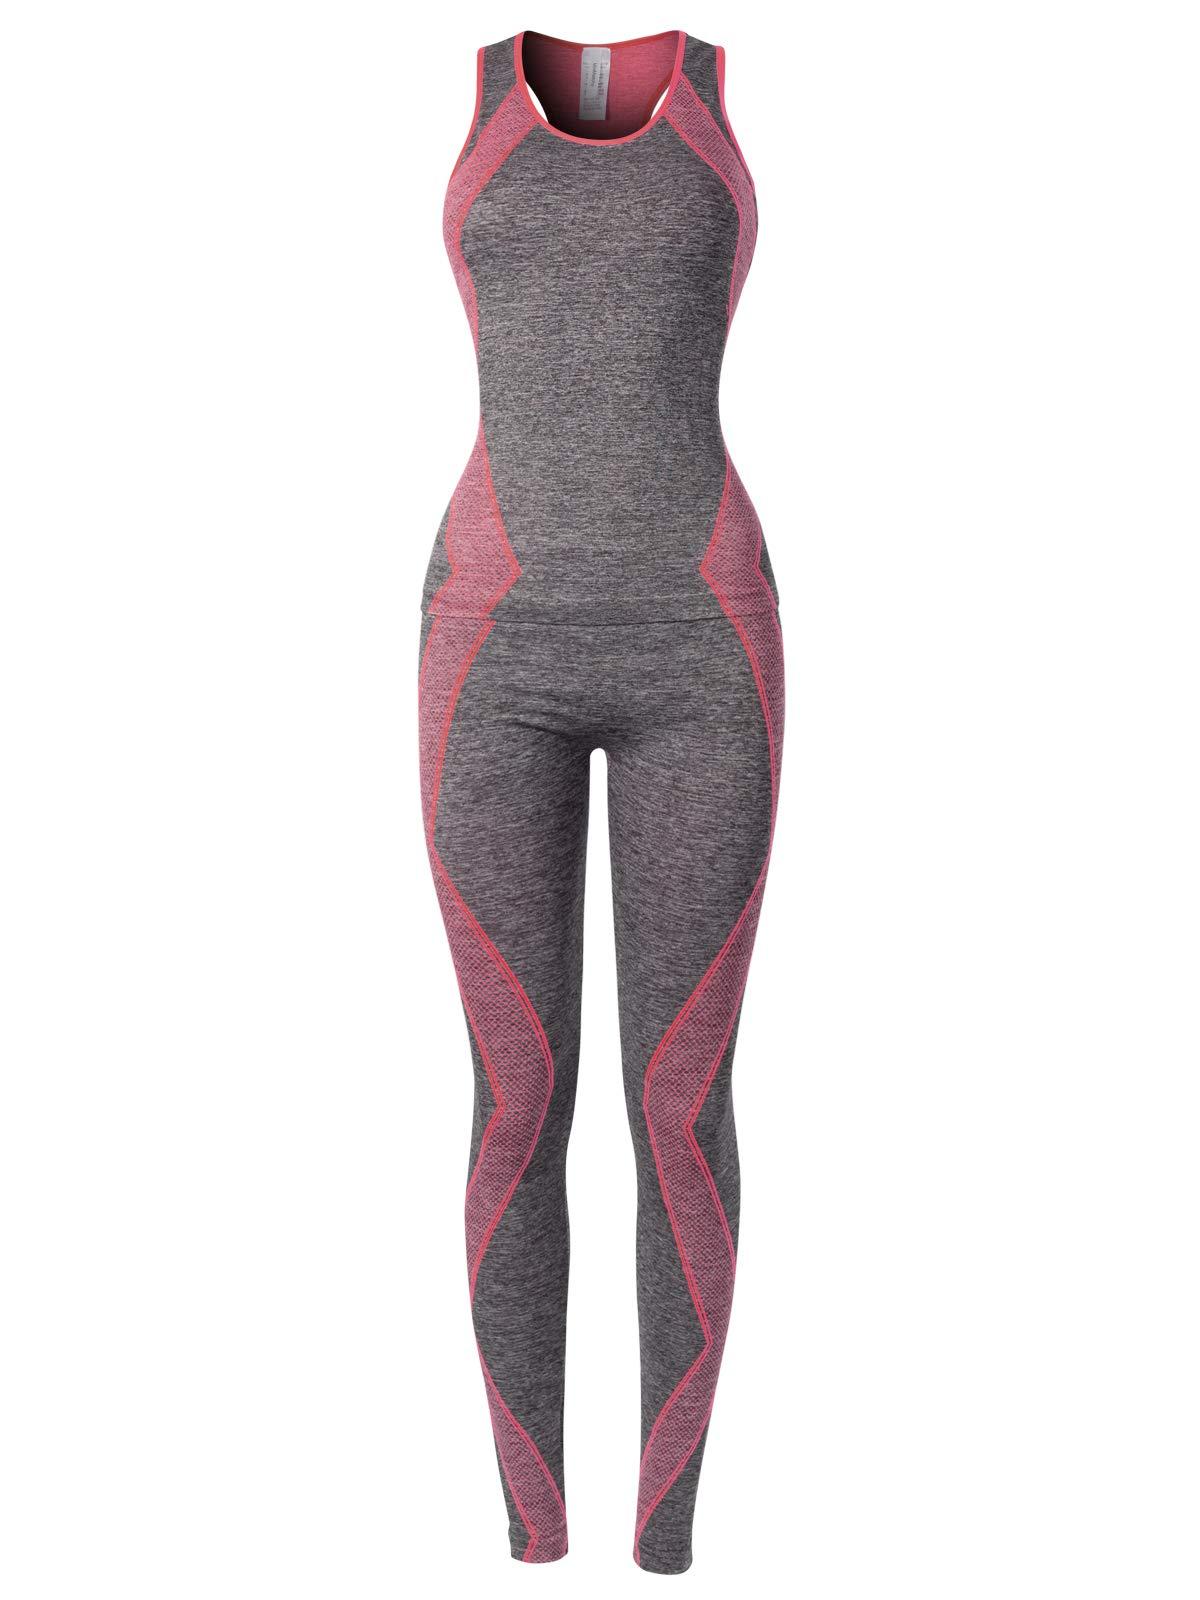 MixMatchy Women's Sports Gym Yoga Workout Activewear Sets Top & Leggings Set Grey/Hot Pink ONE by MixMatchy